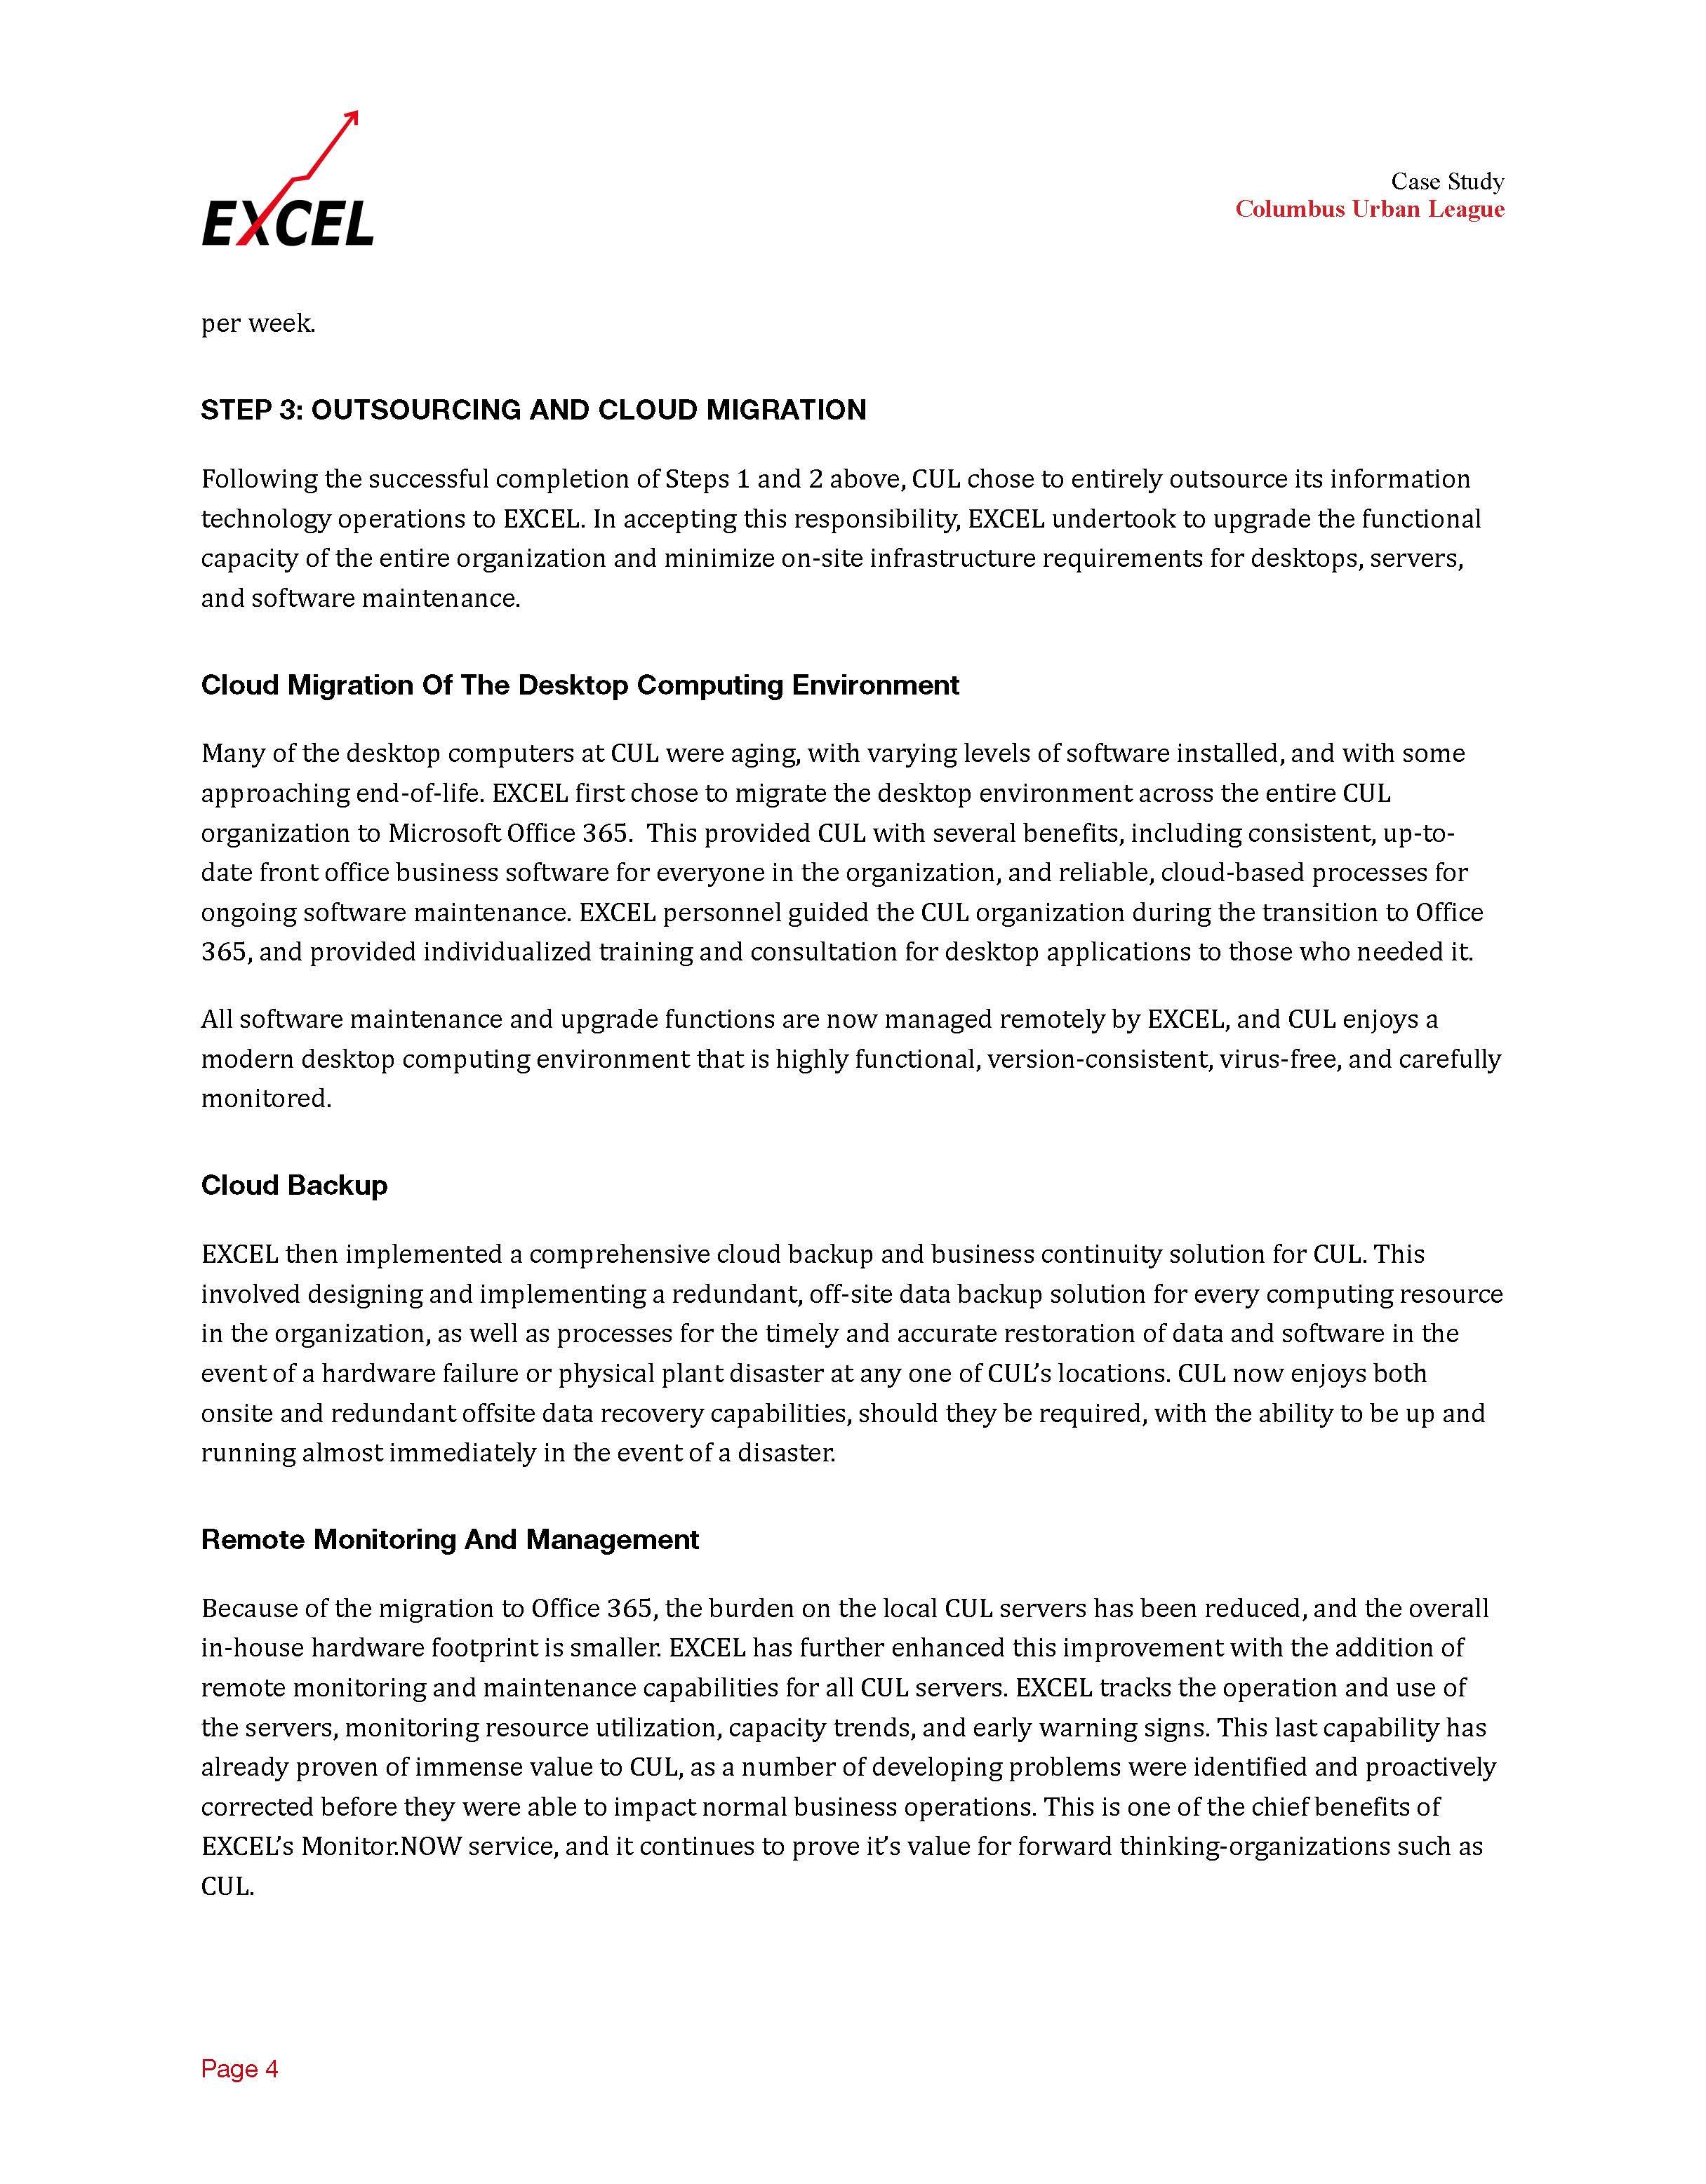 Case Study - CUL v3_Page_4.jpg